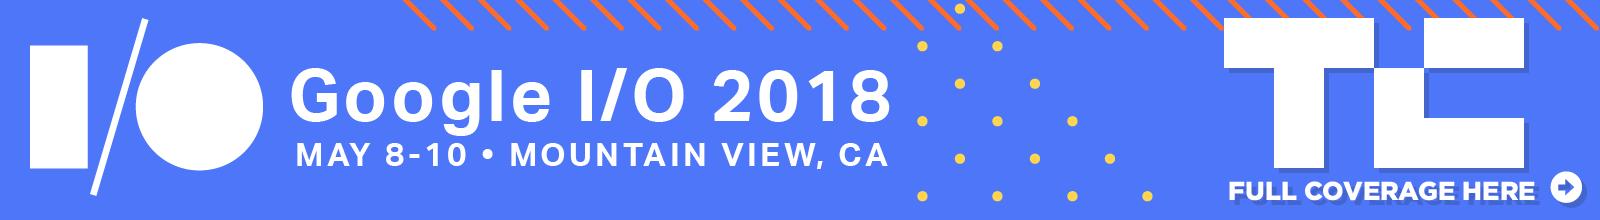 google io 2018 banner 3